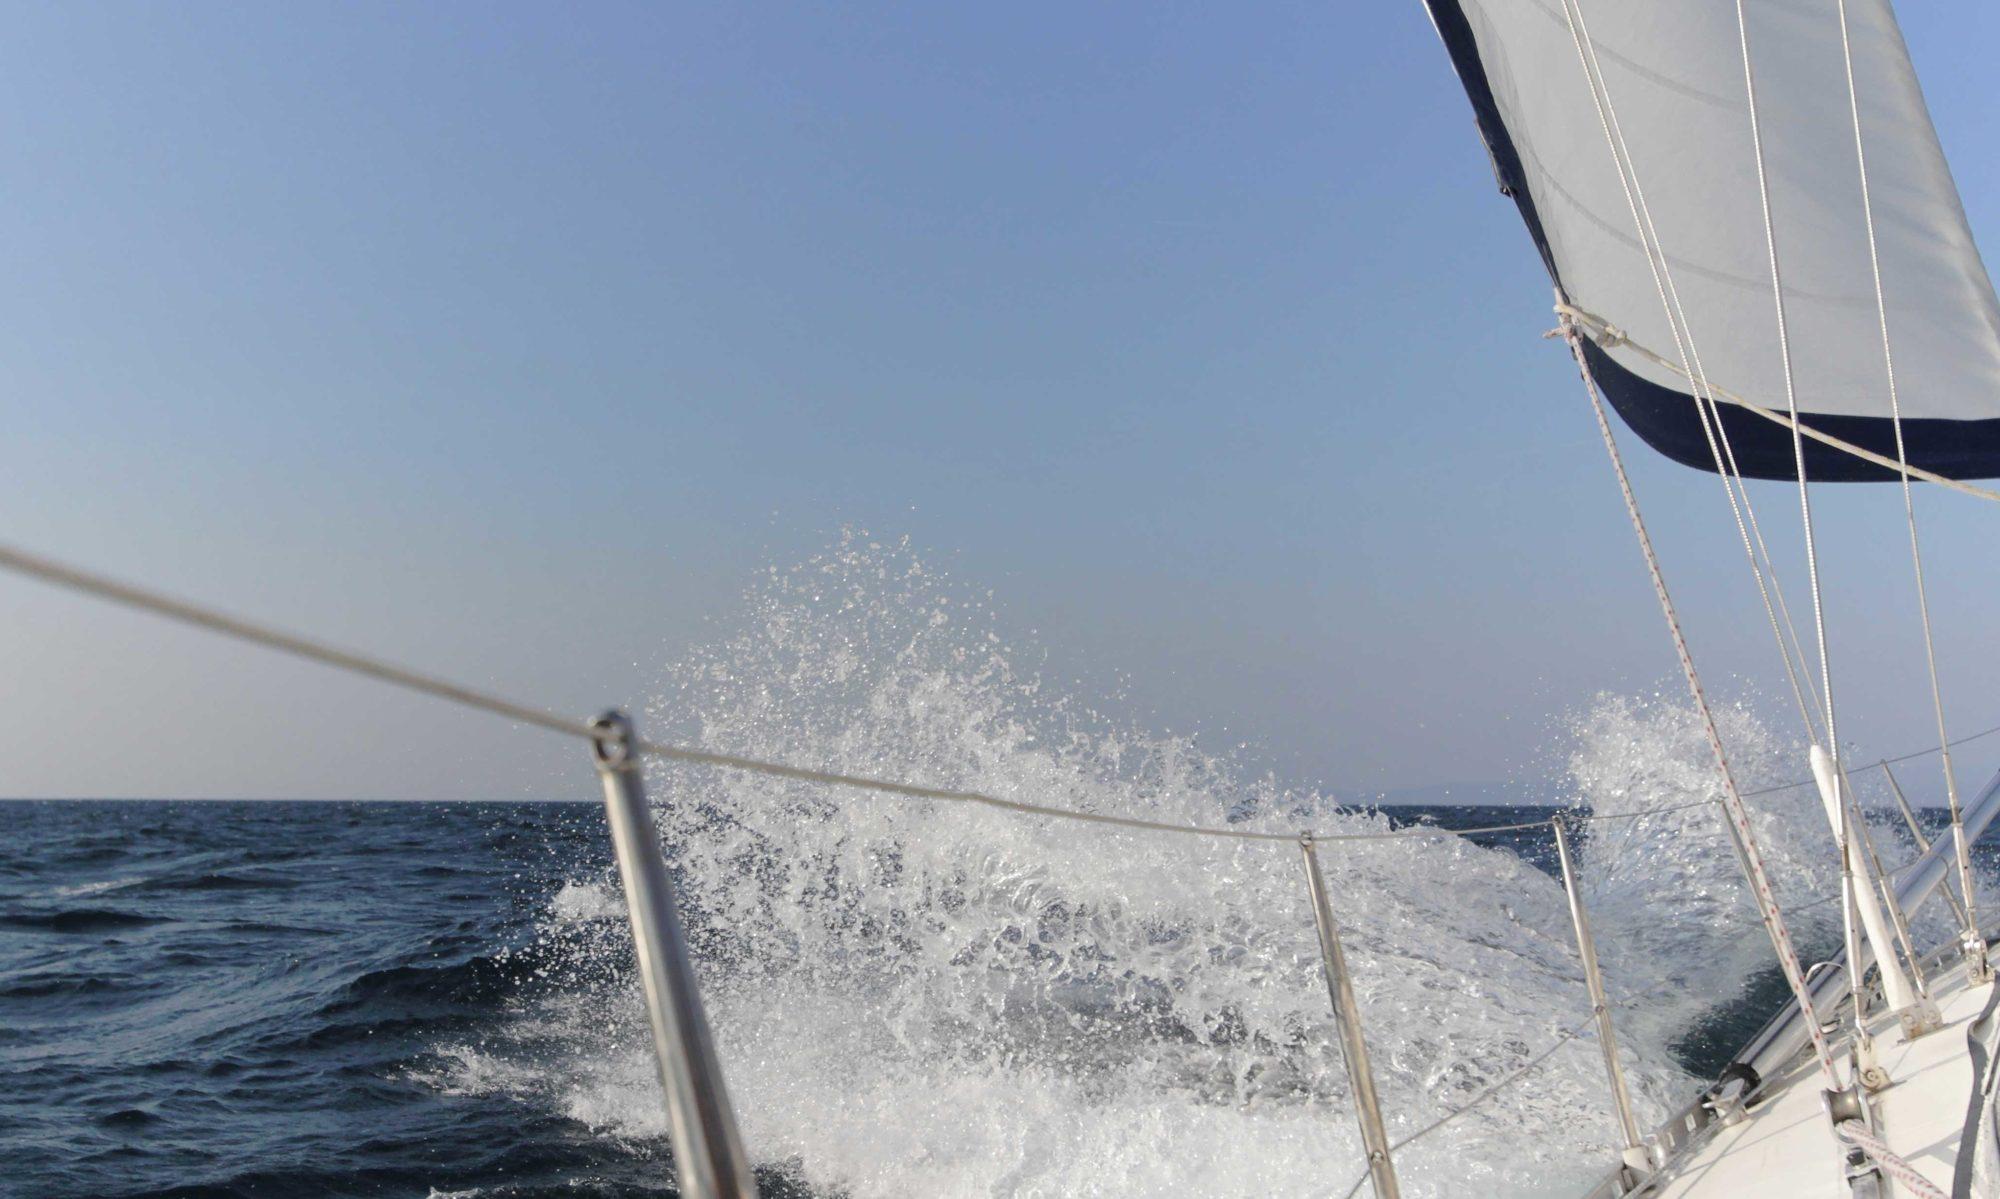 Taru Segelsport